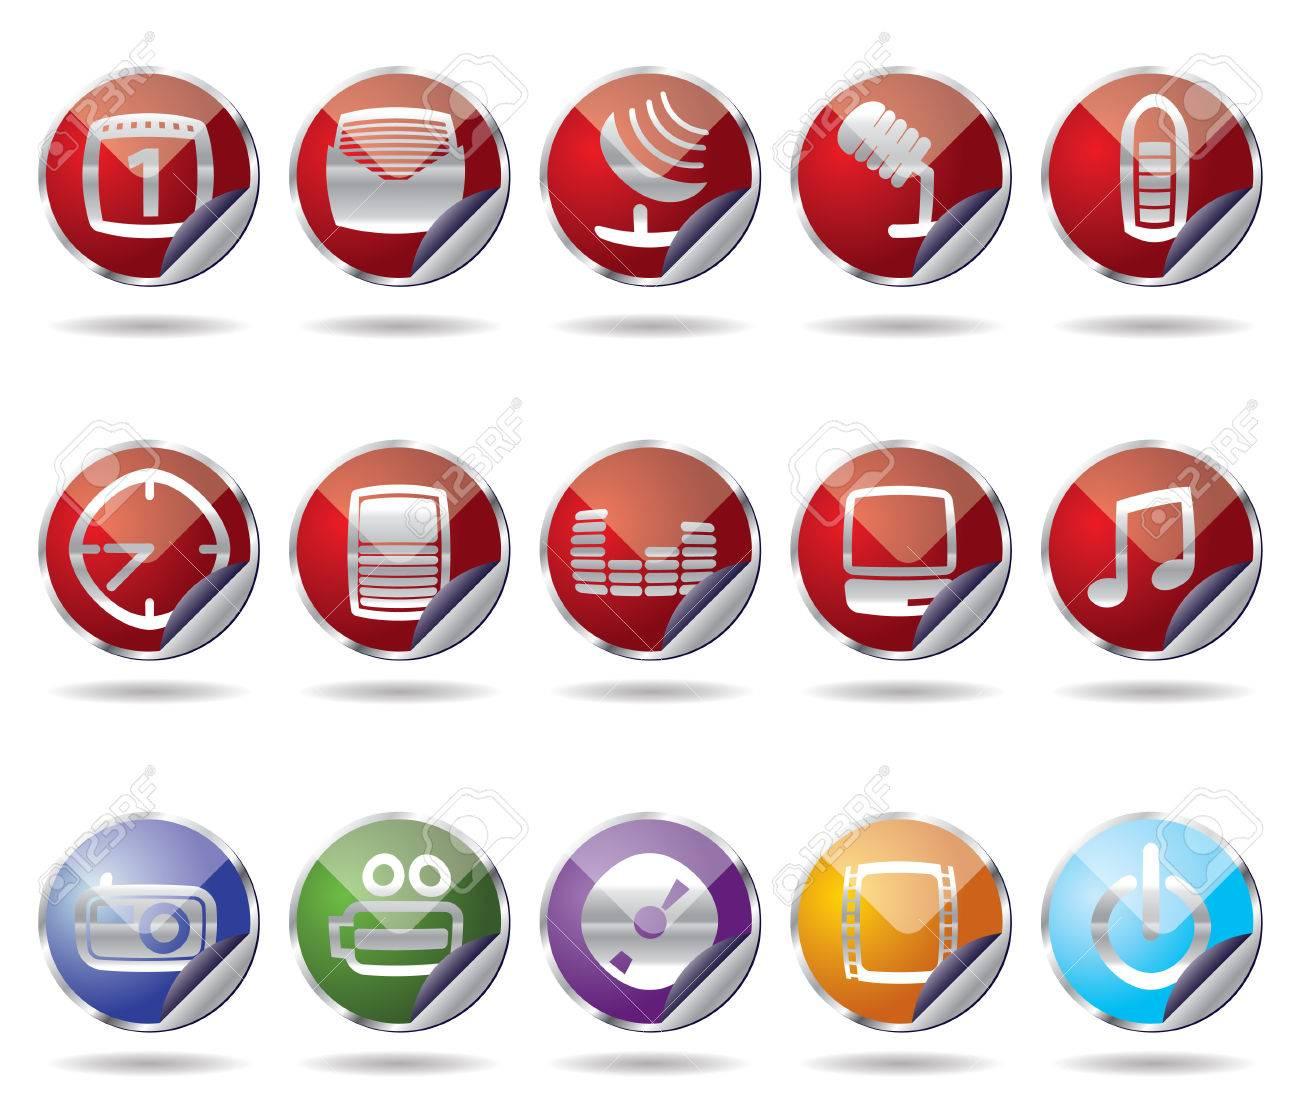 phone icon performance Stock Vector - 4397187